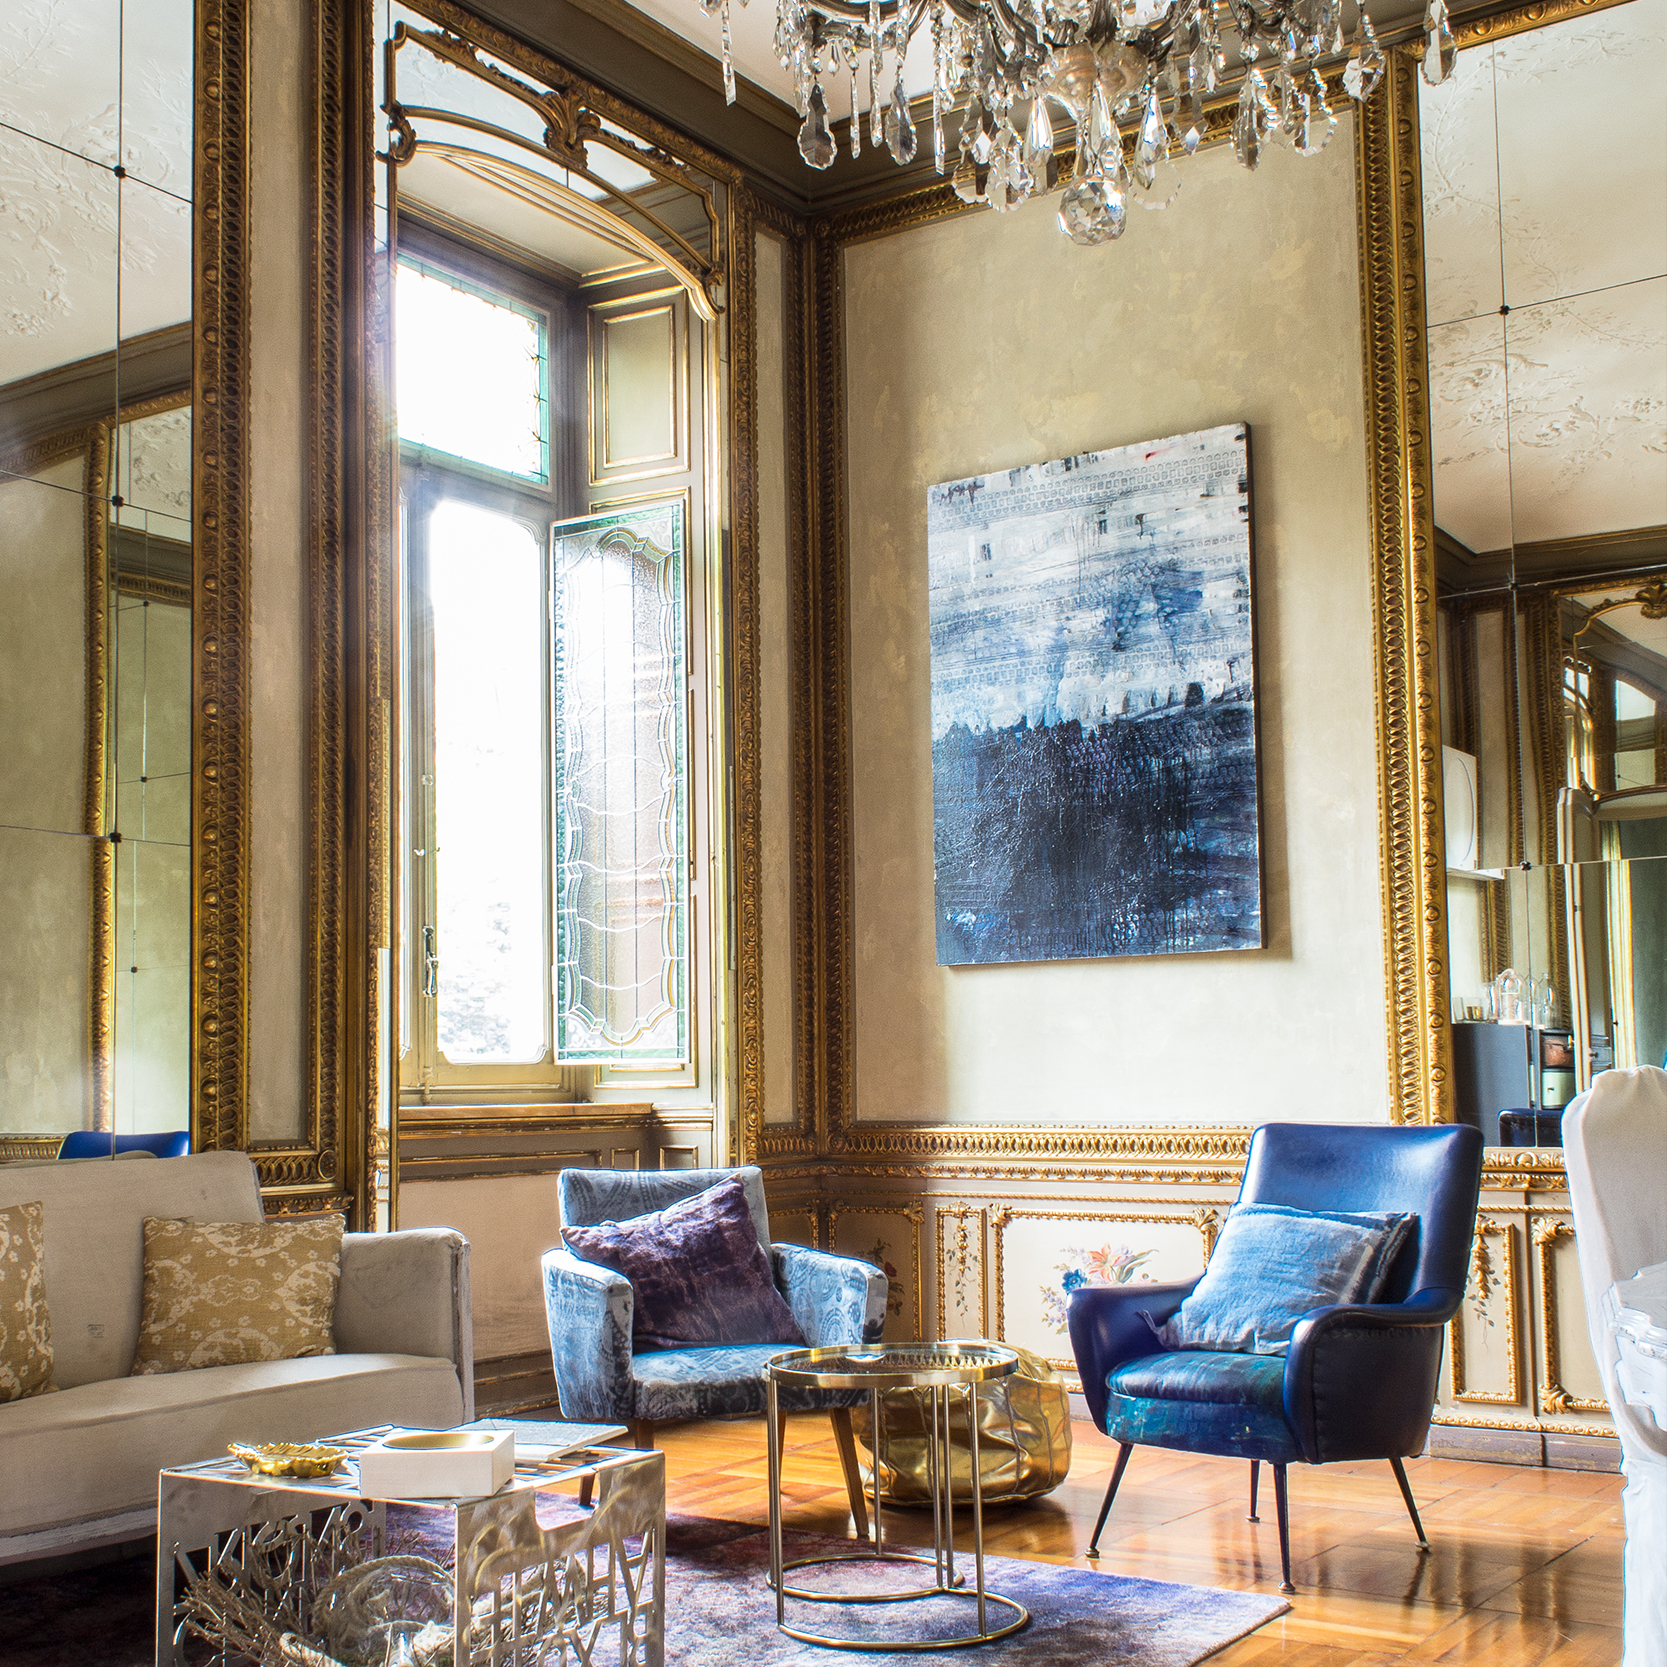 Suite Matteotti EDIT2